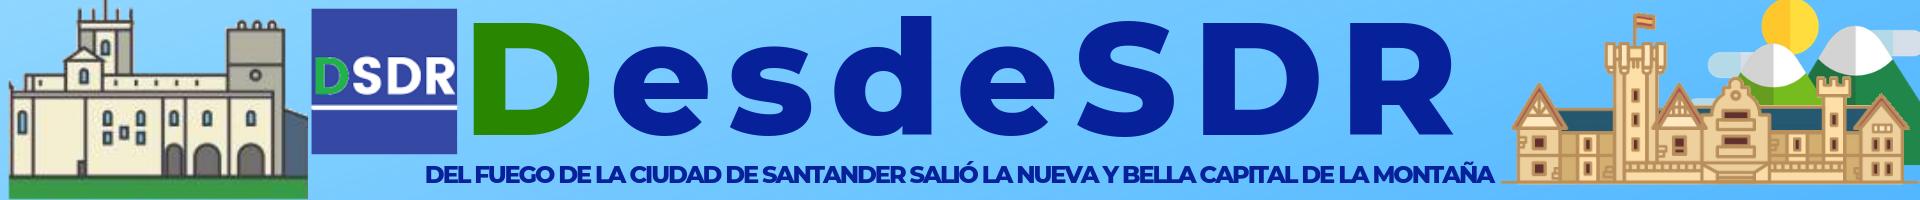 DesdeSDR